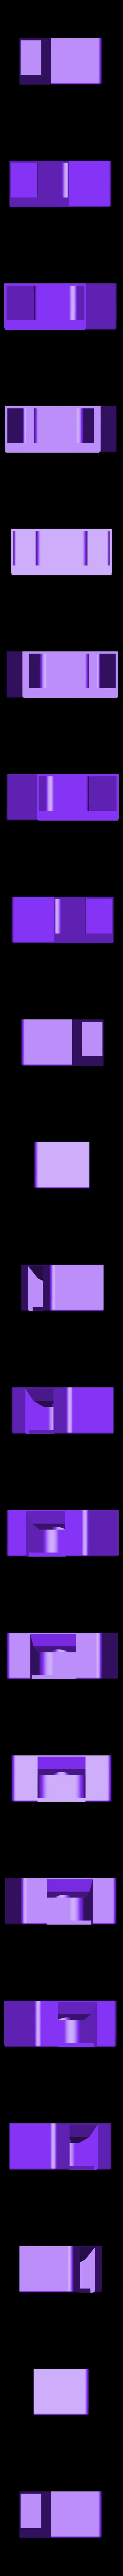 BOTTOM PART (x1).stl Download free STL file Toothpaste Dispenser • 3D print model, Anthony_SA